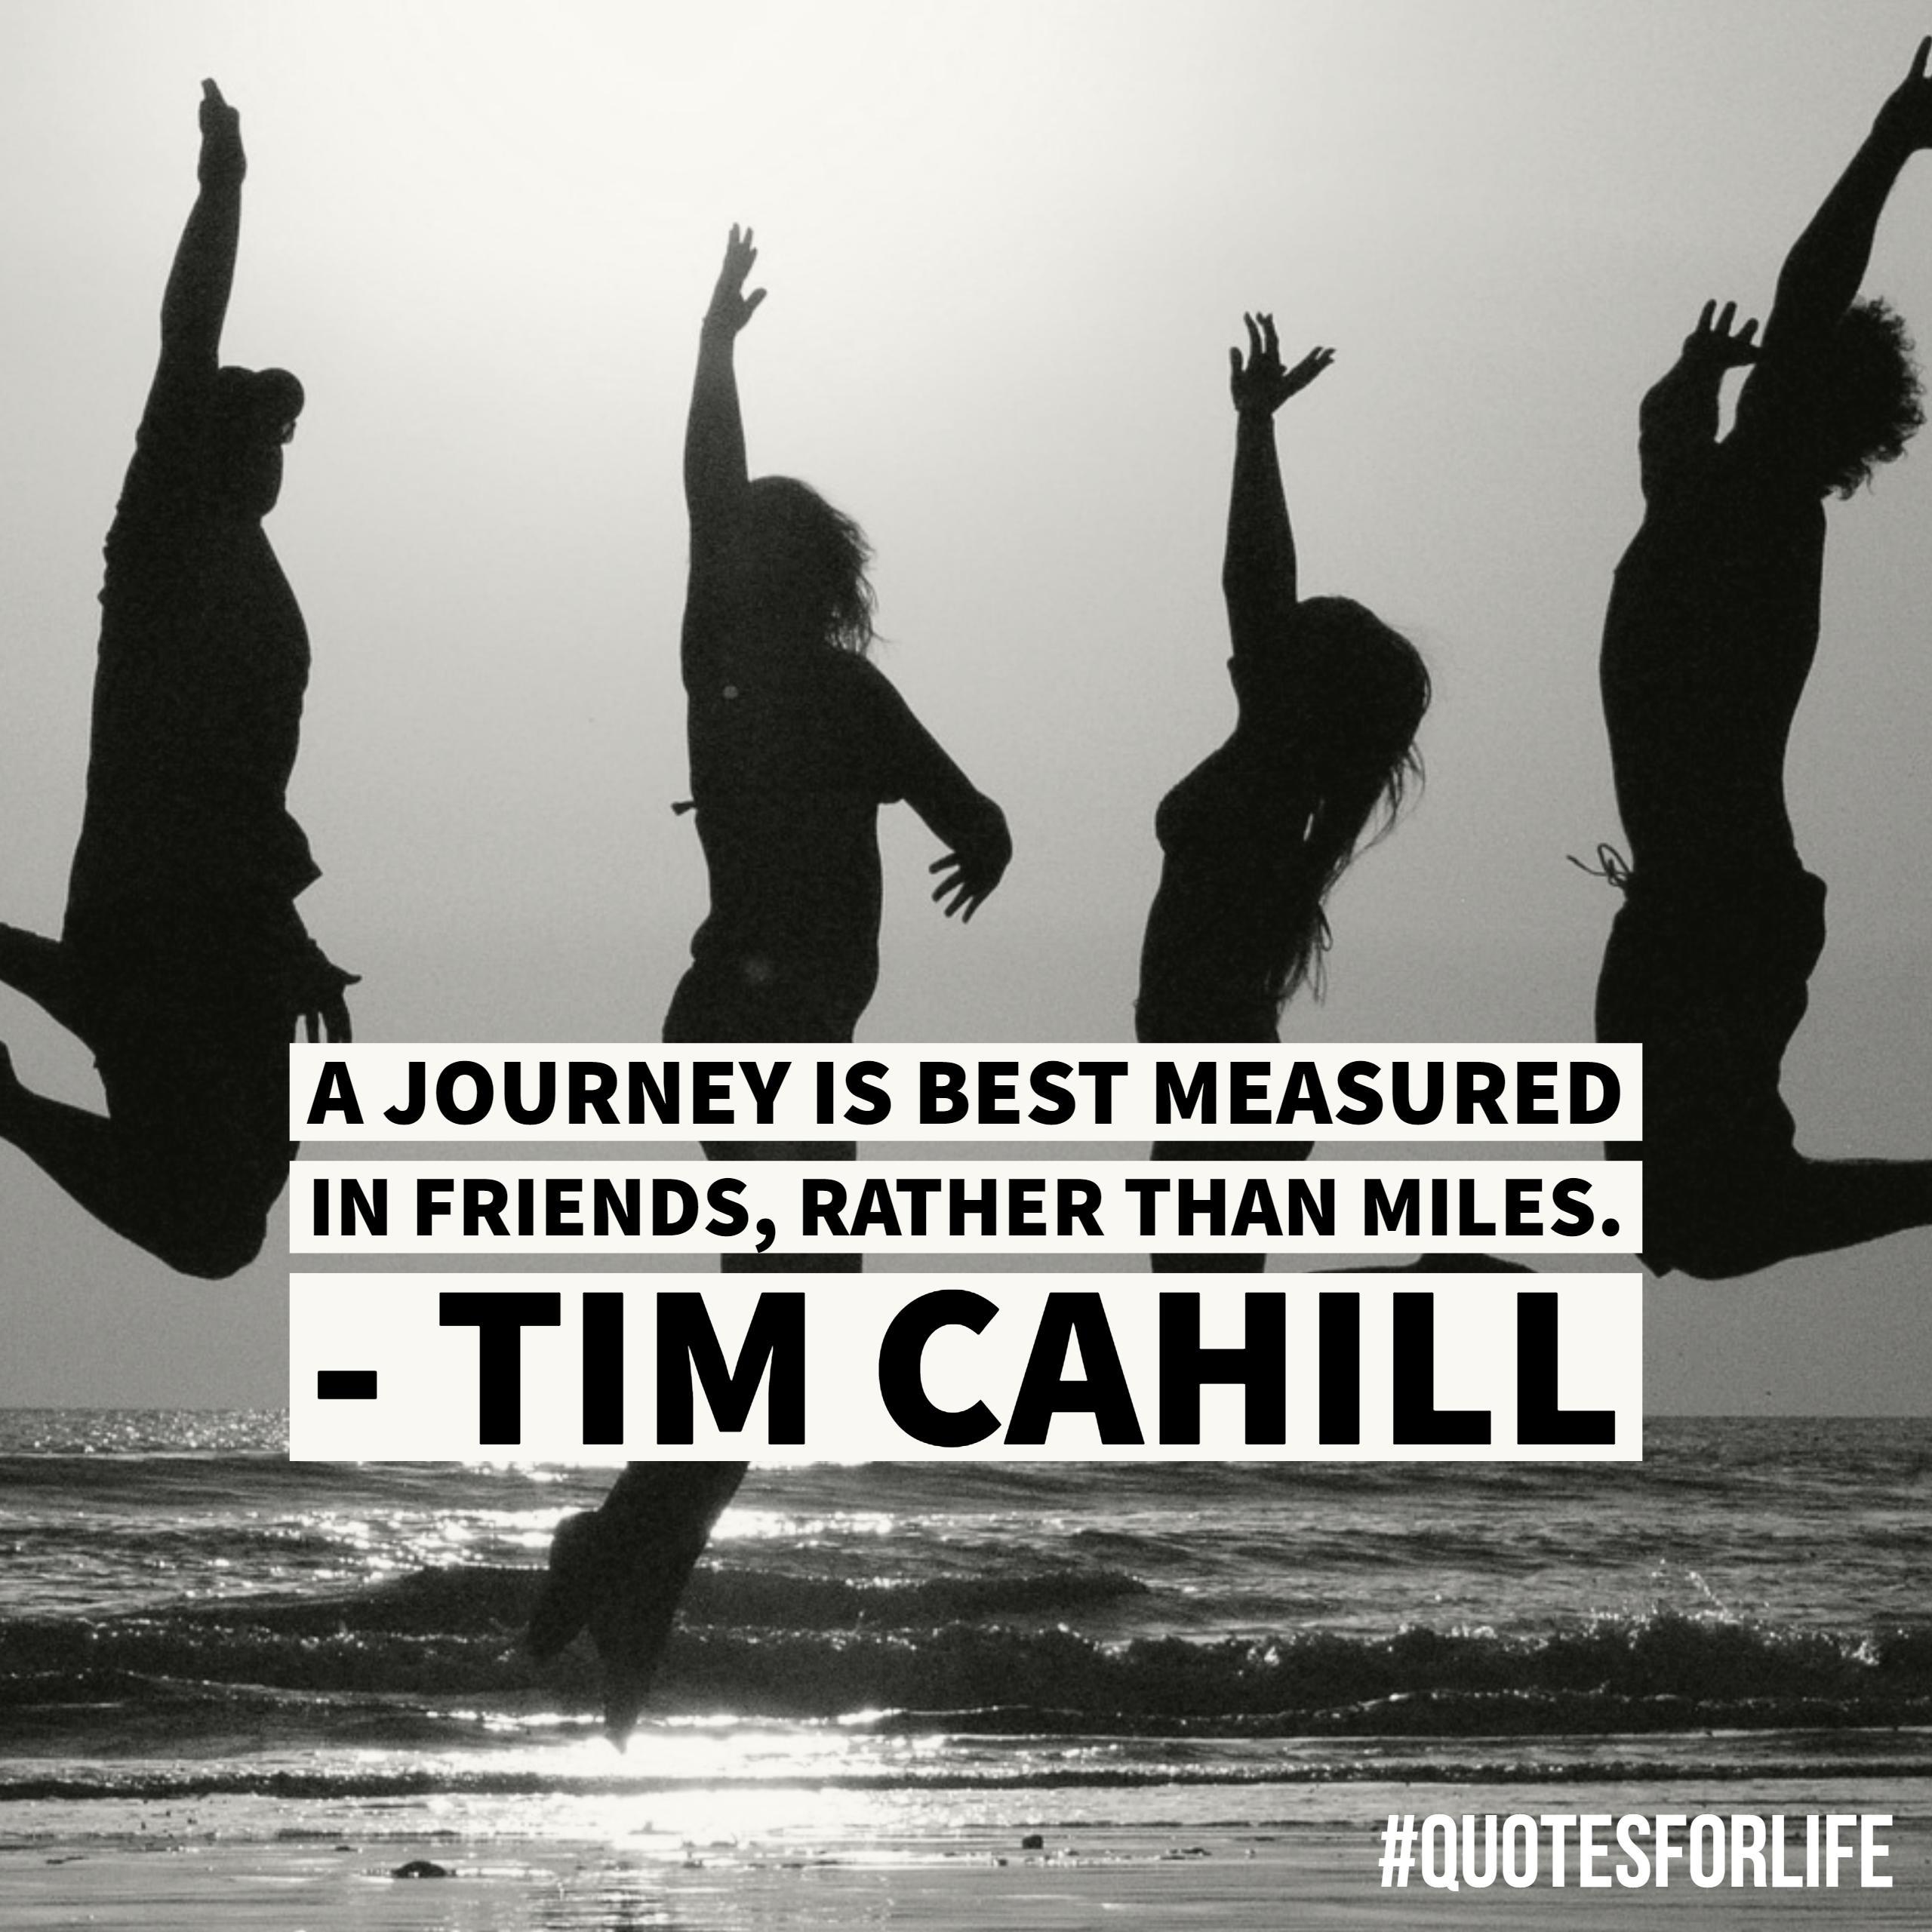 Tim Cahill